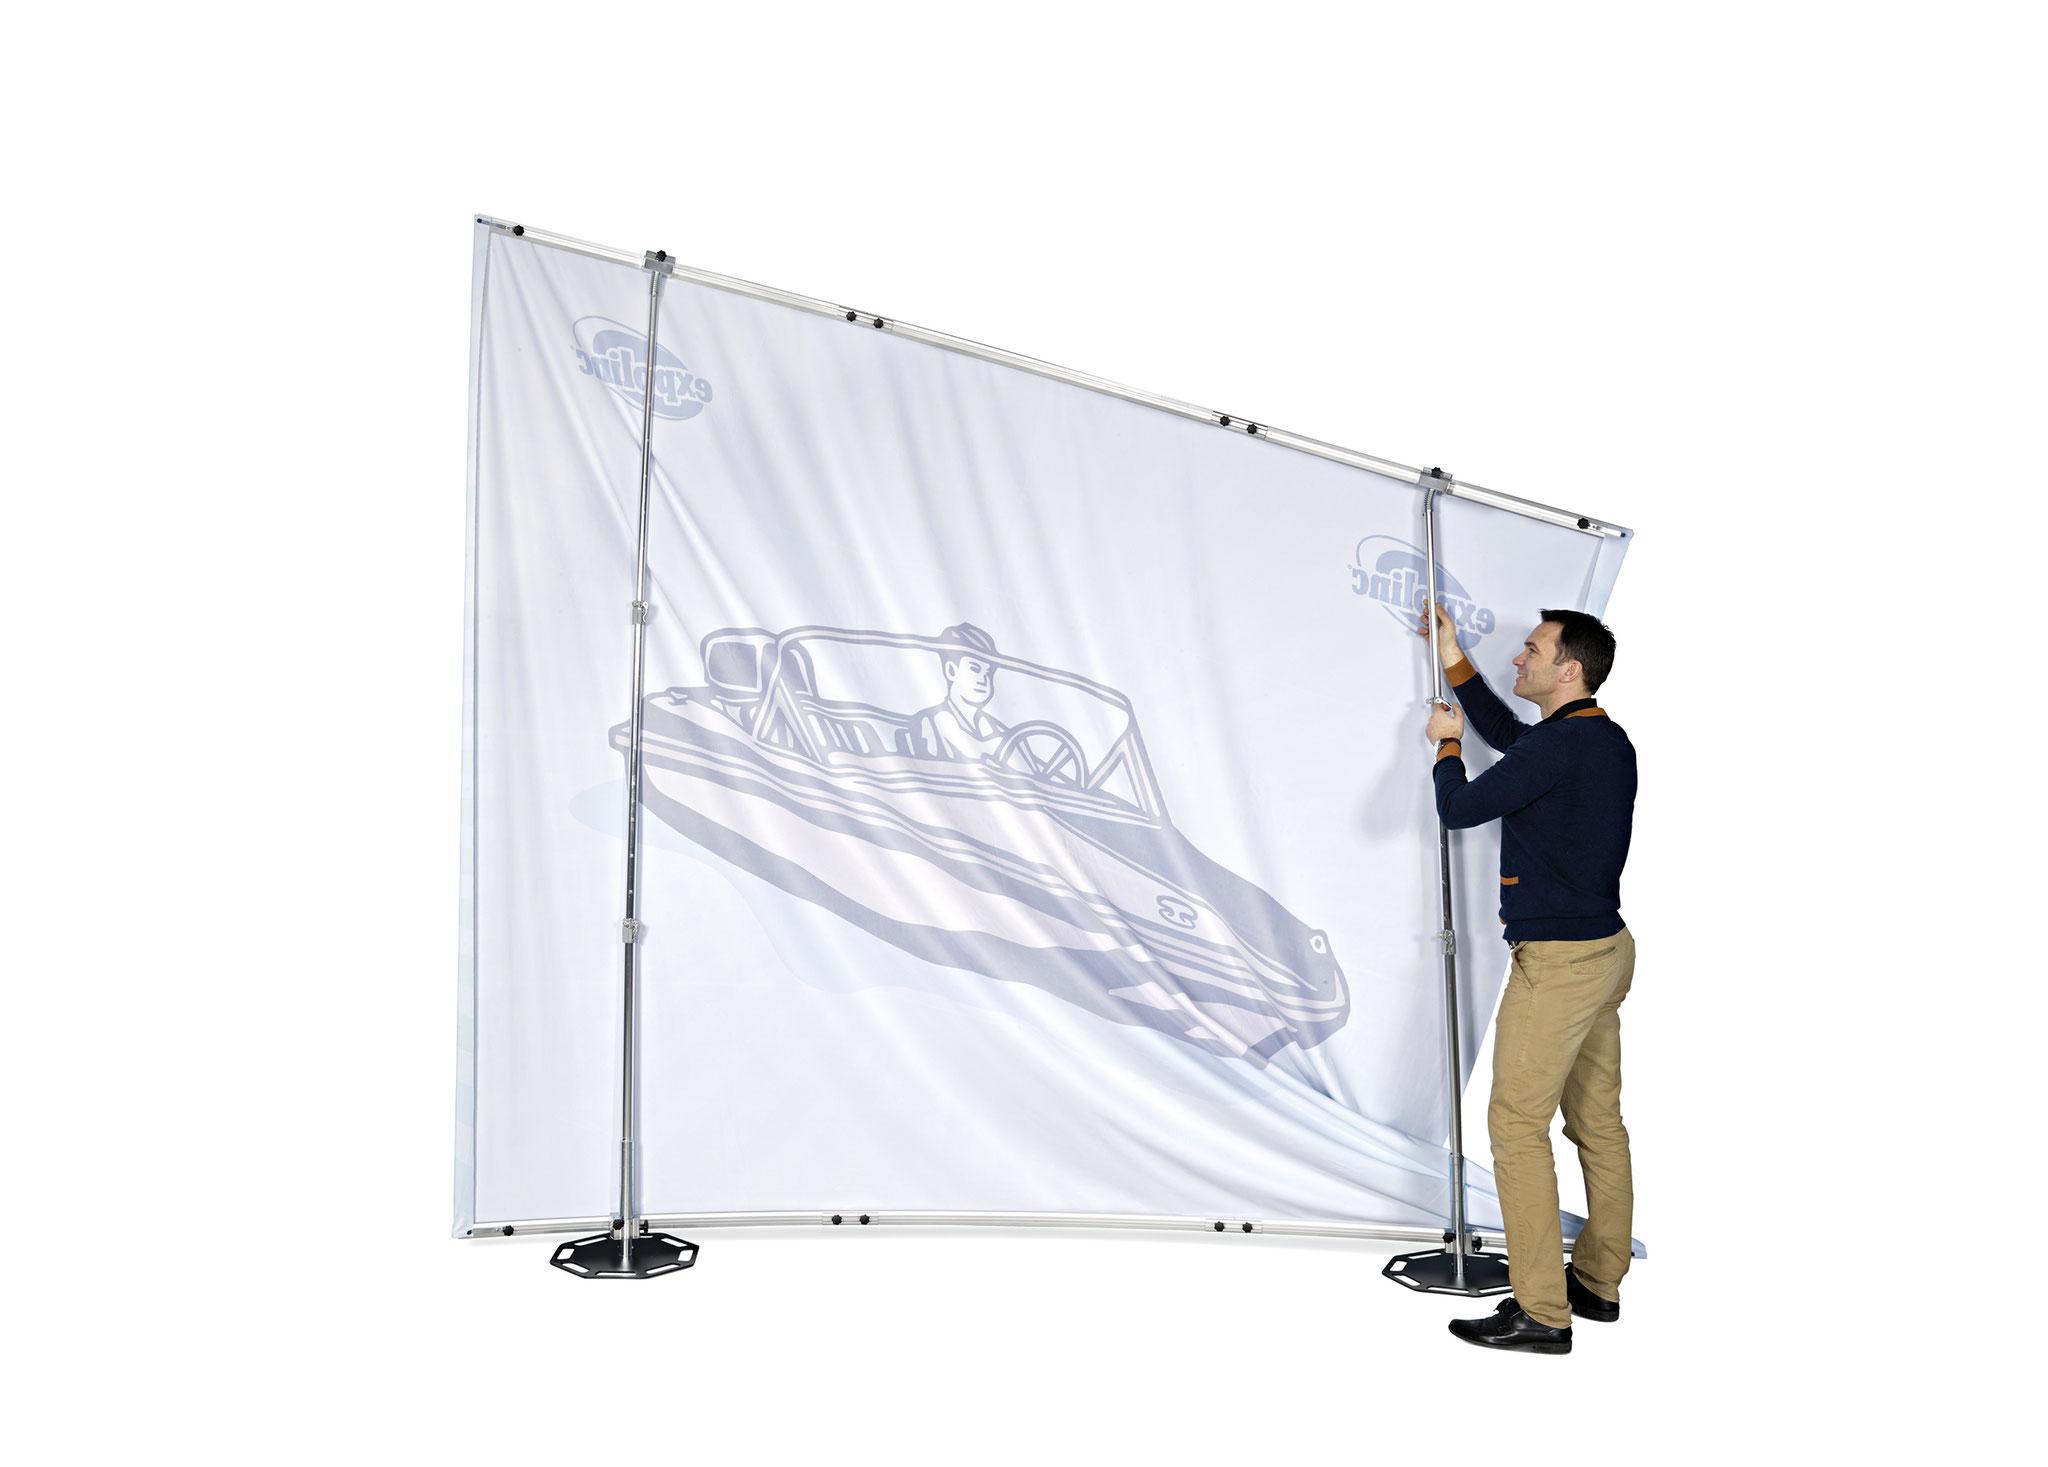 Expolinc Fabric System Höhenverstellung